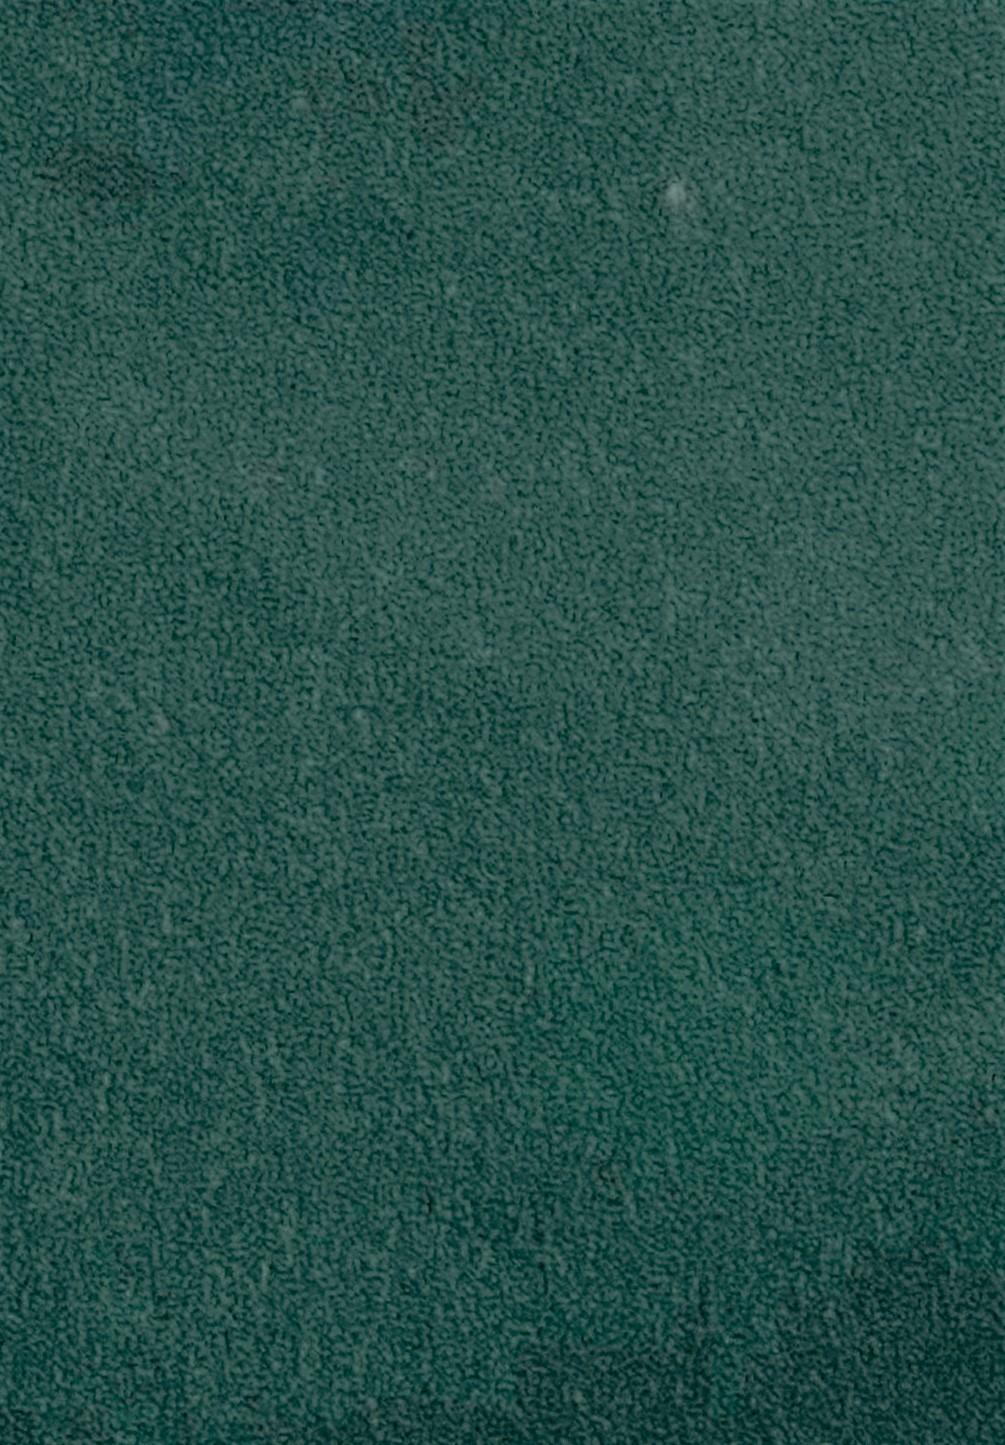 wool_148-60916-green